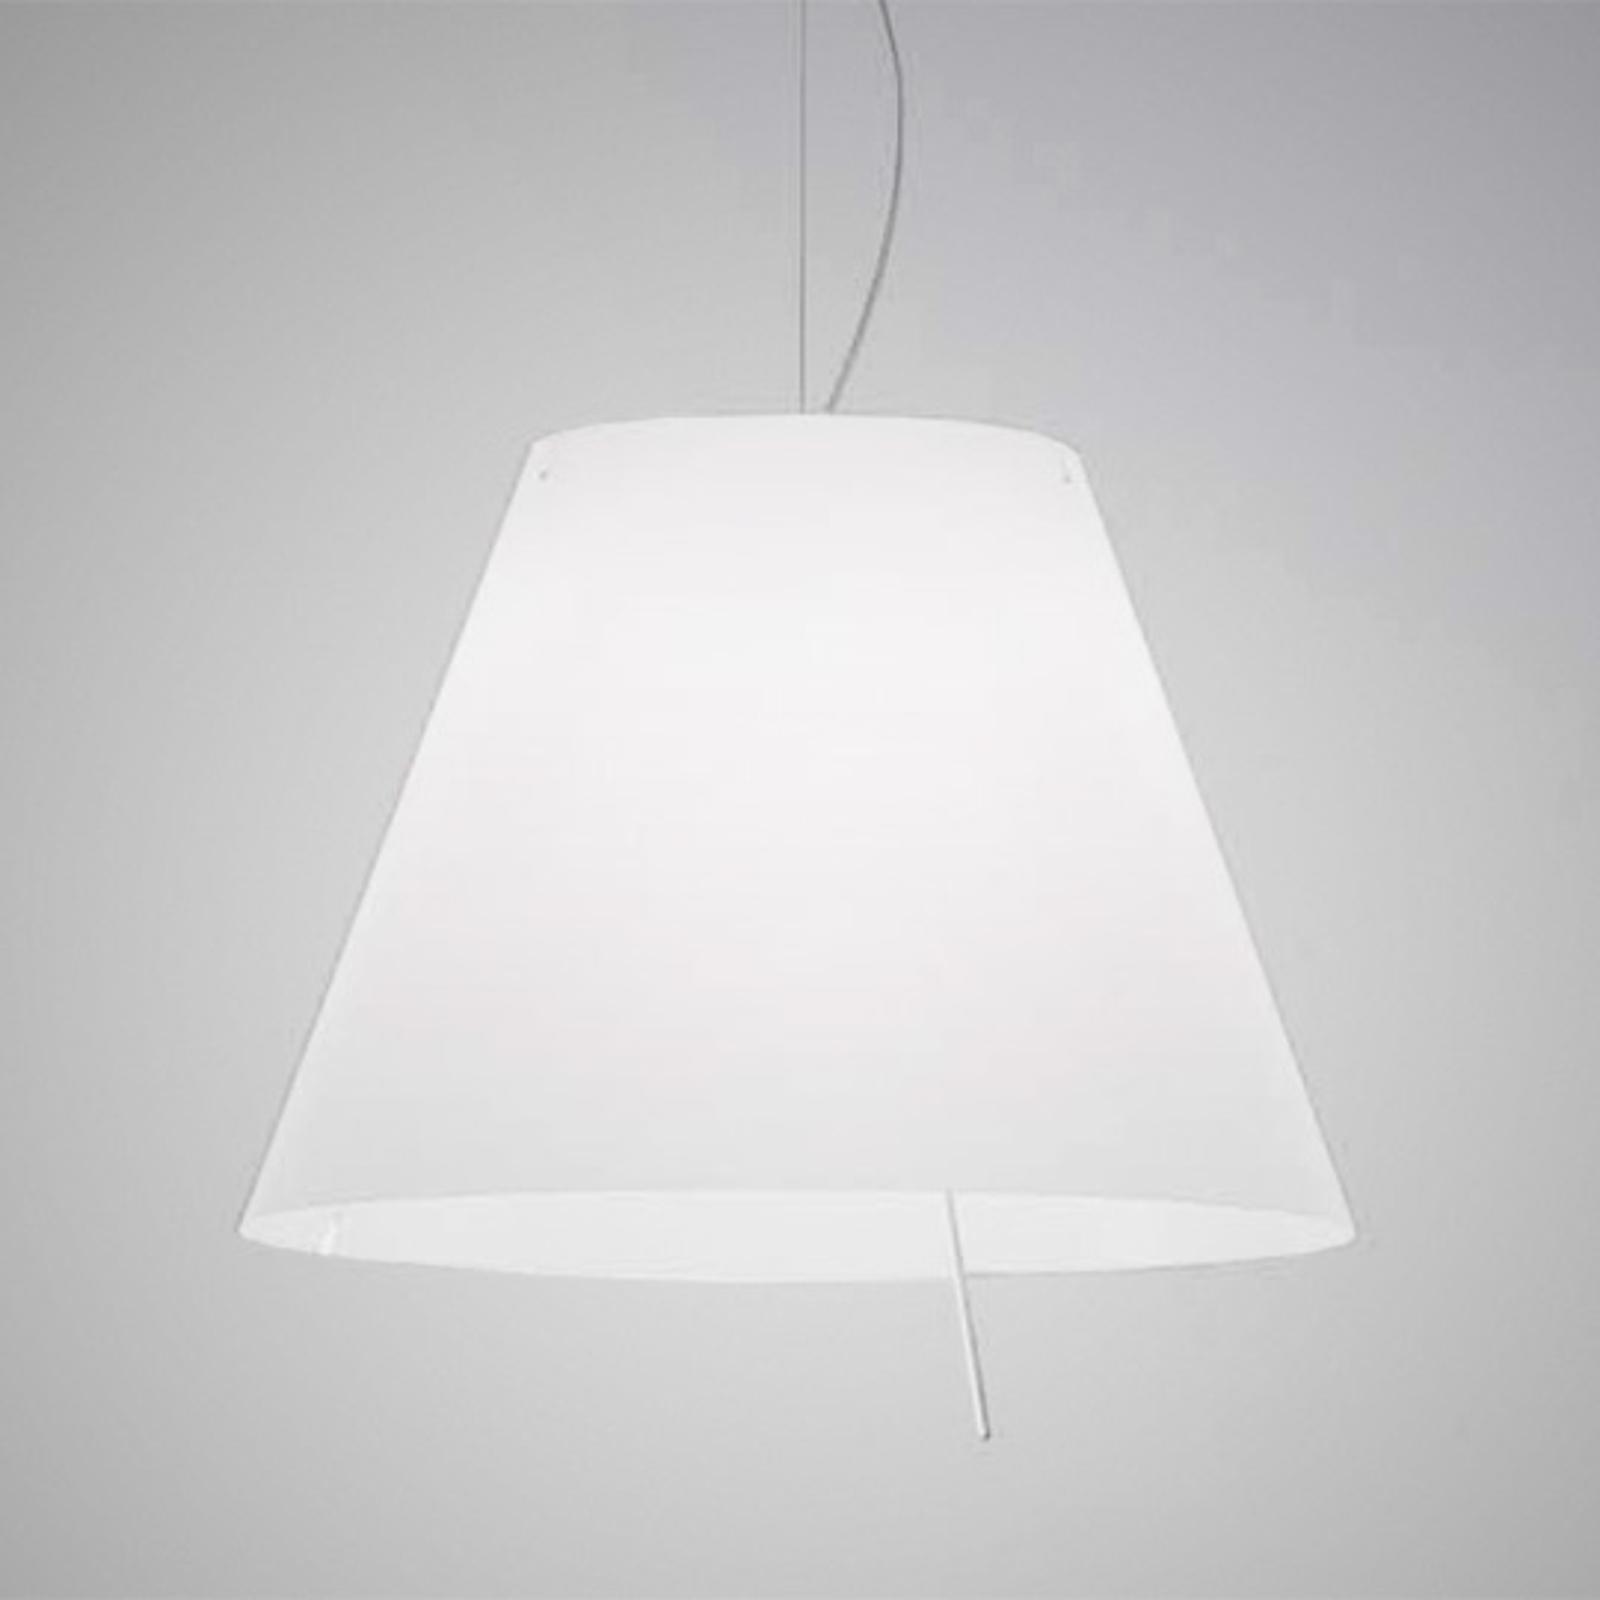 Hanglamp Grande Constanza in wit